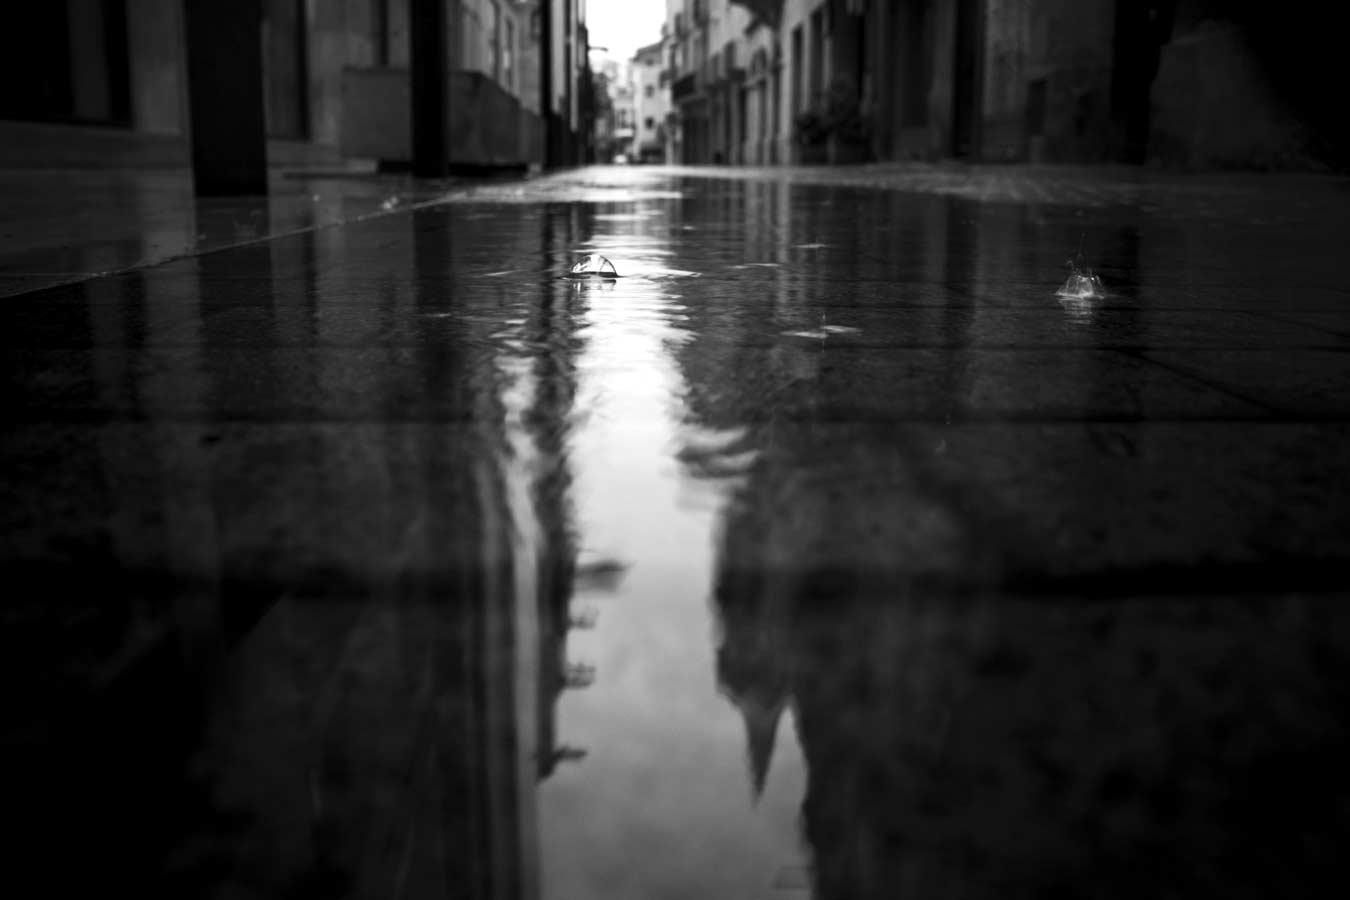 pluja carrer santa maria igualada reflexe cal ratés